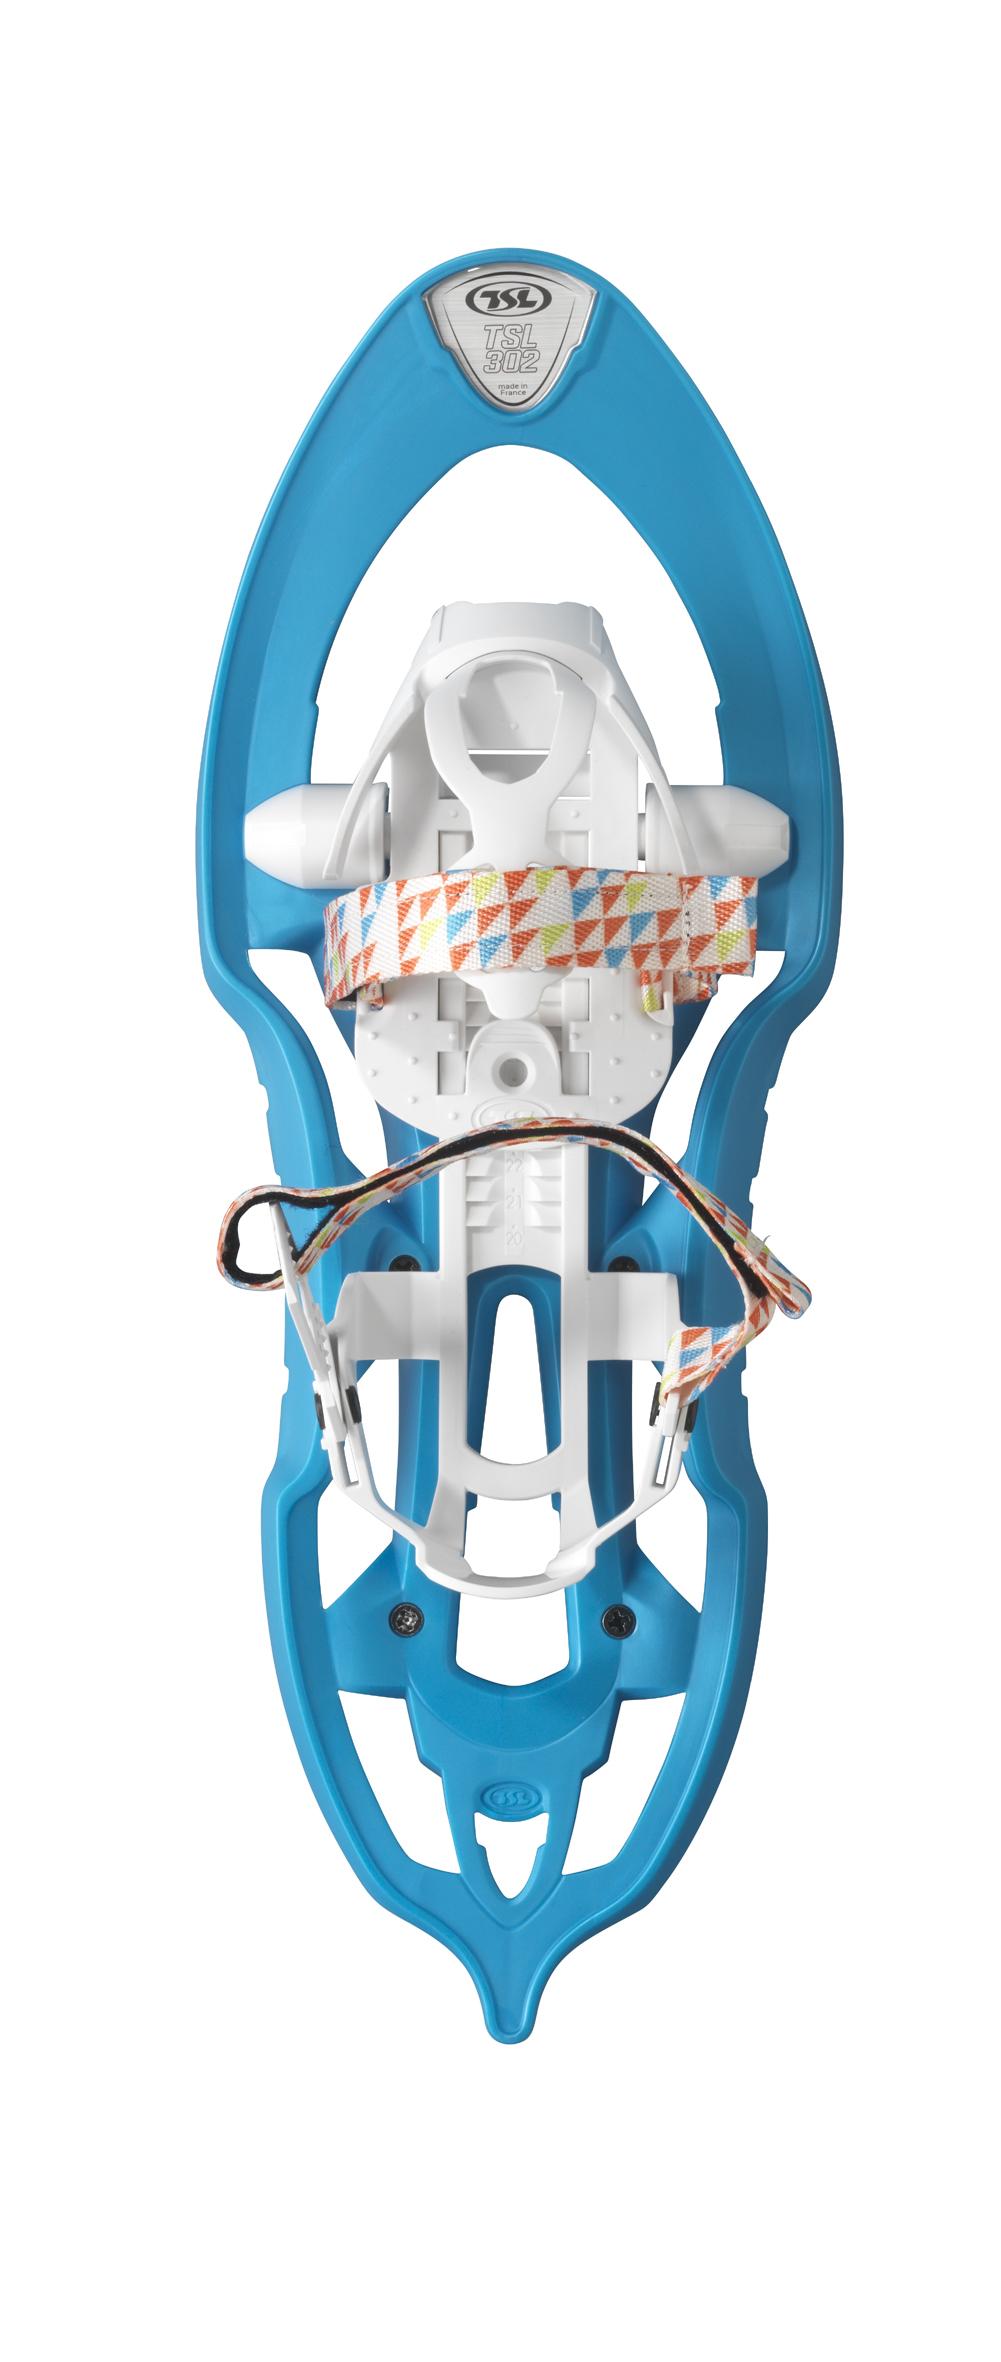 TSL Outdoor - Composite TSL 302 Freeze - Snowshoes